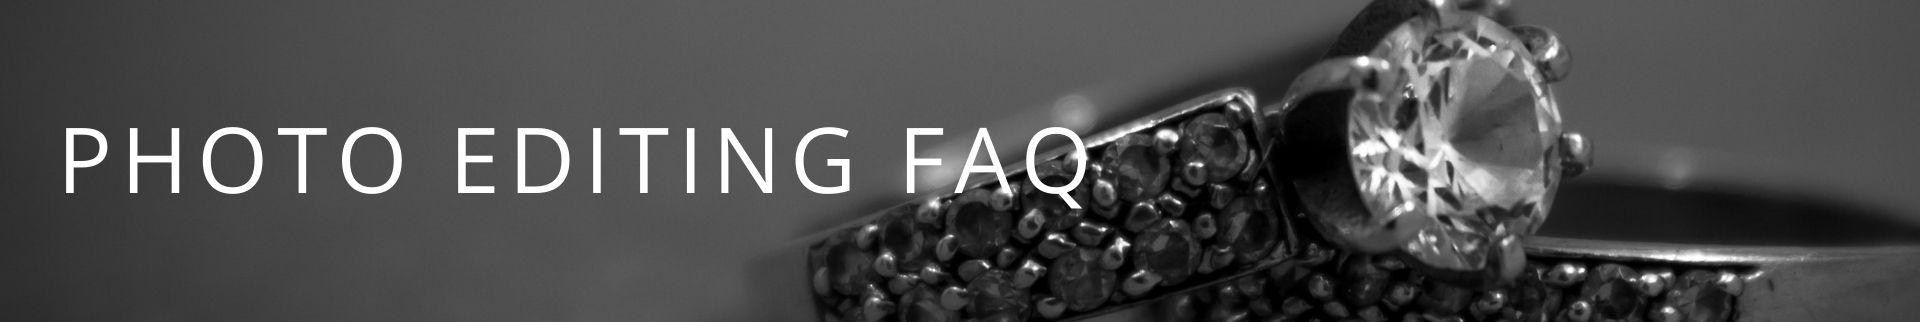 Photo Editing Services FAQ | Eretouching India